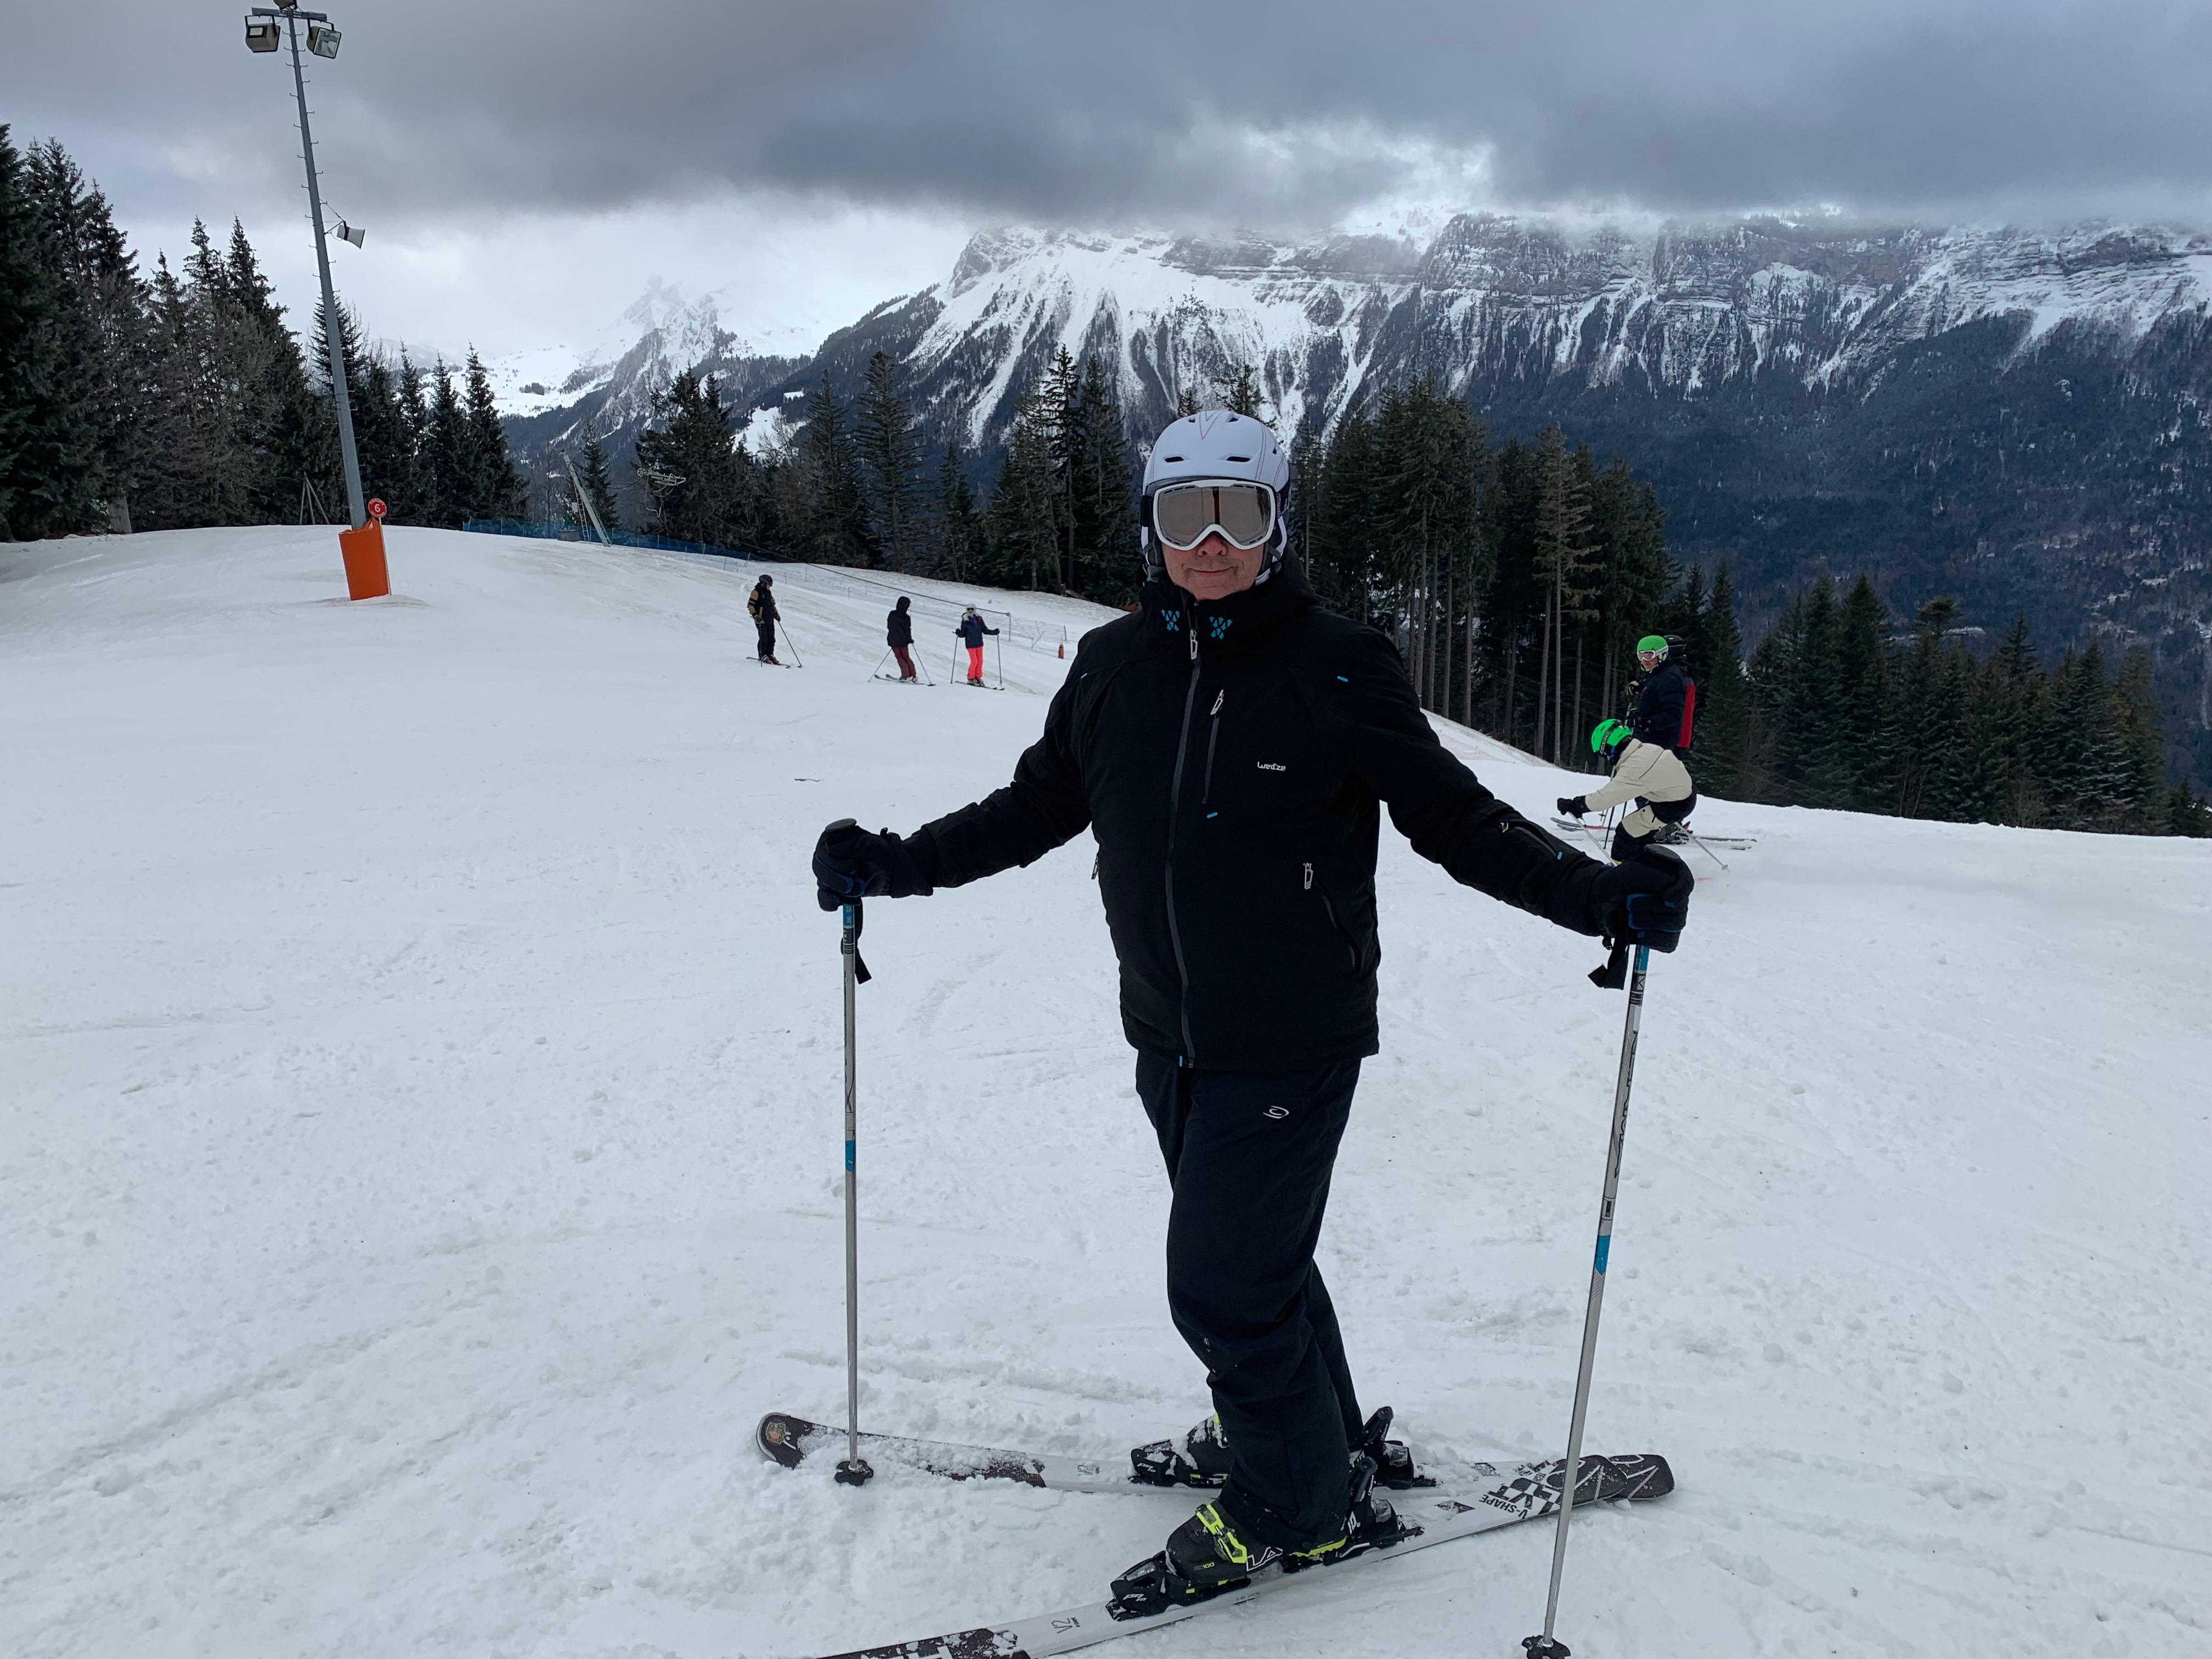 Skiing in Decathlon ski wear in the French Alps